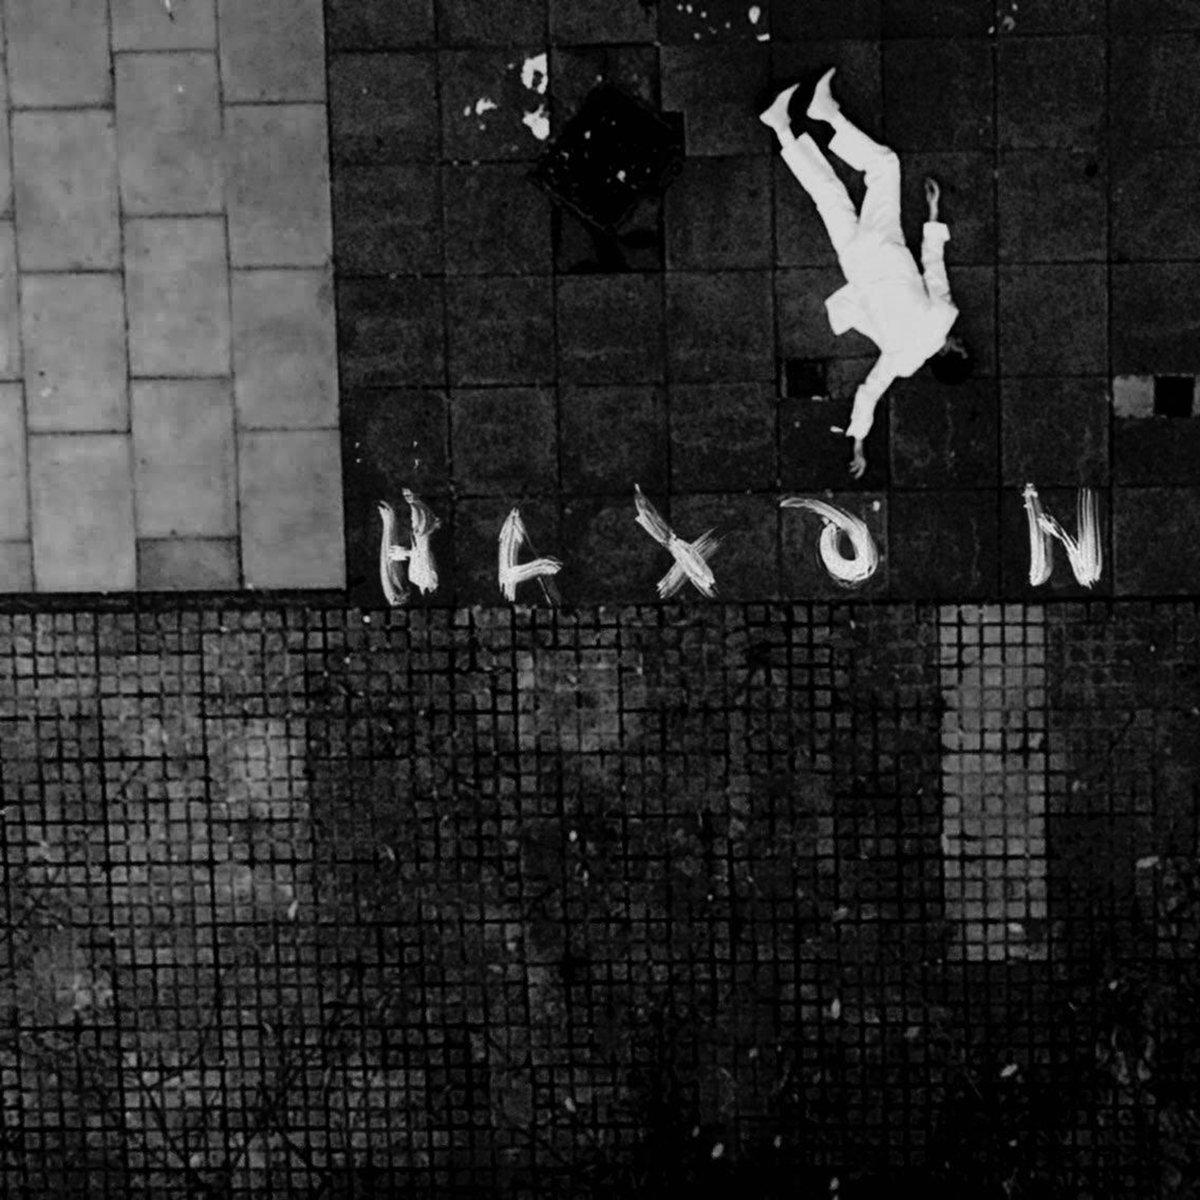 HAXON